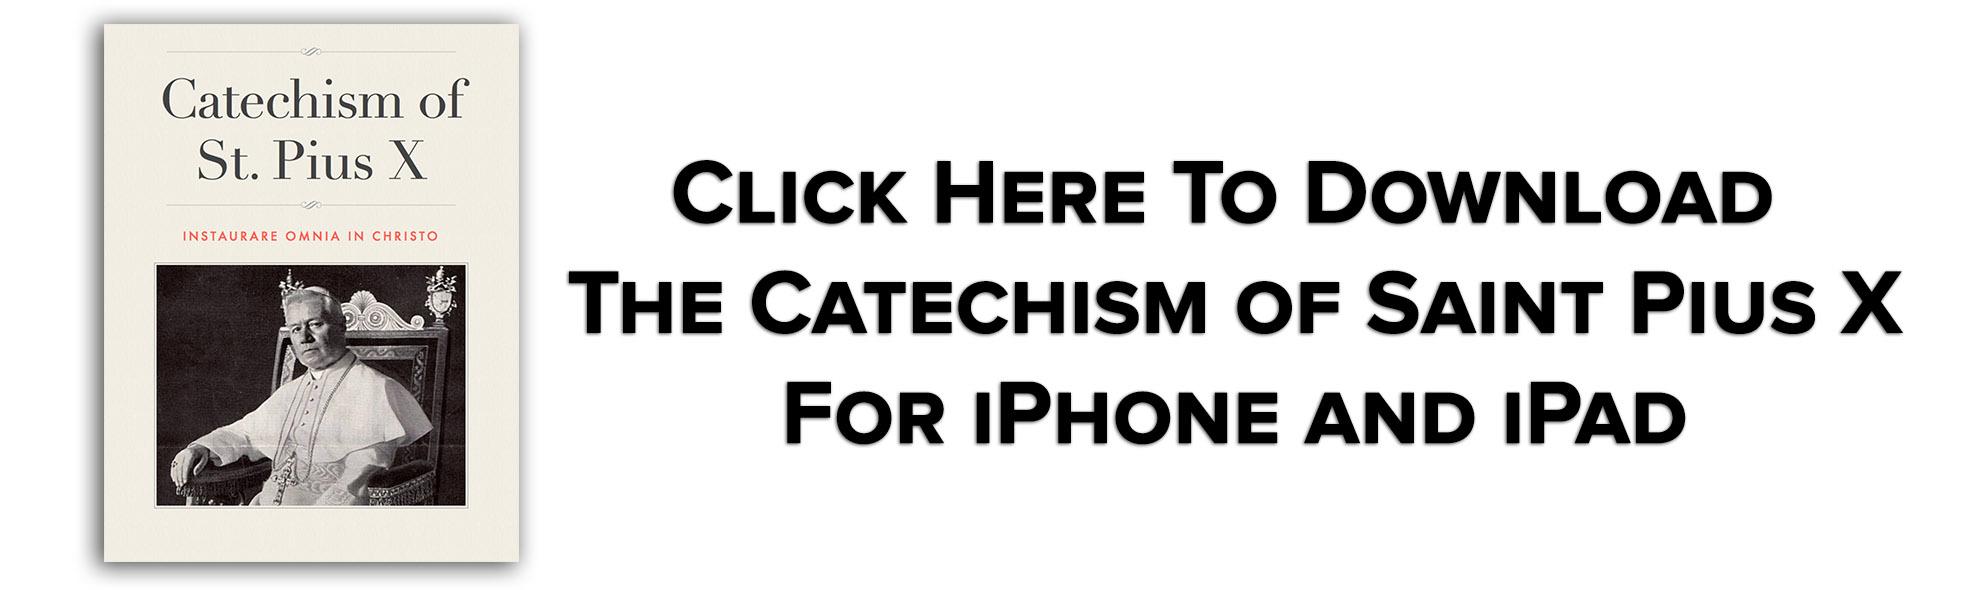 Catechism.jpg